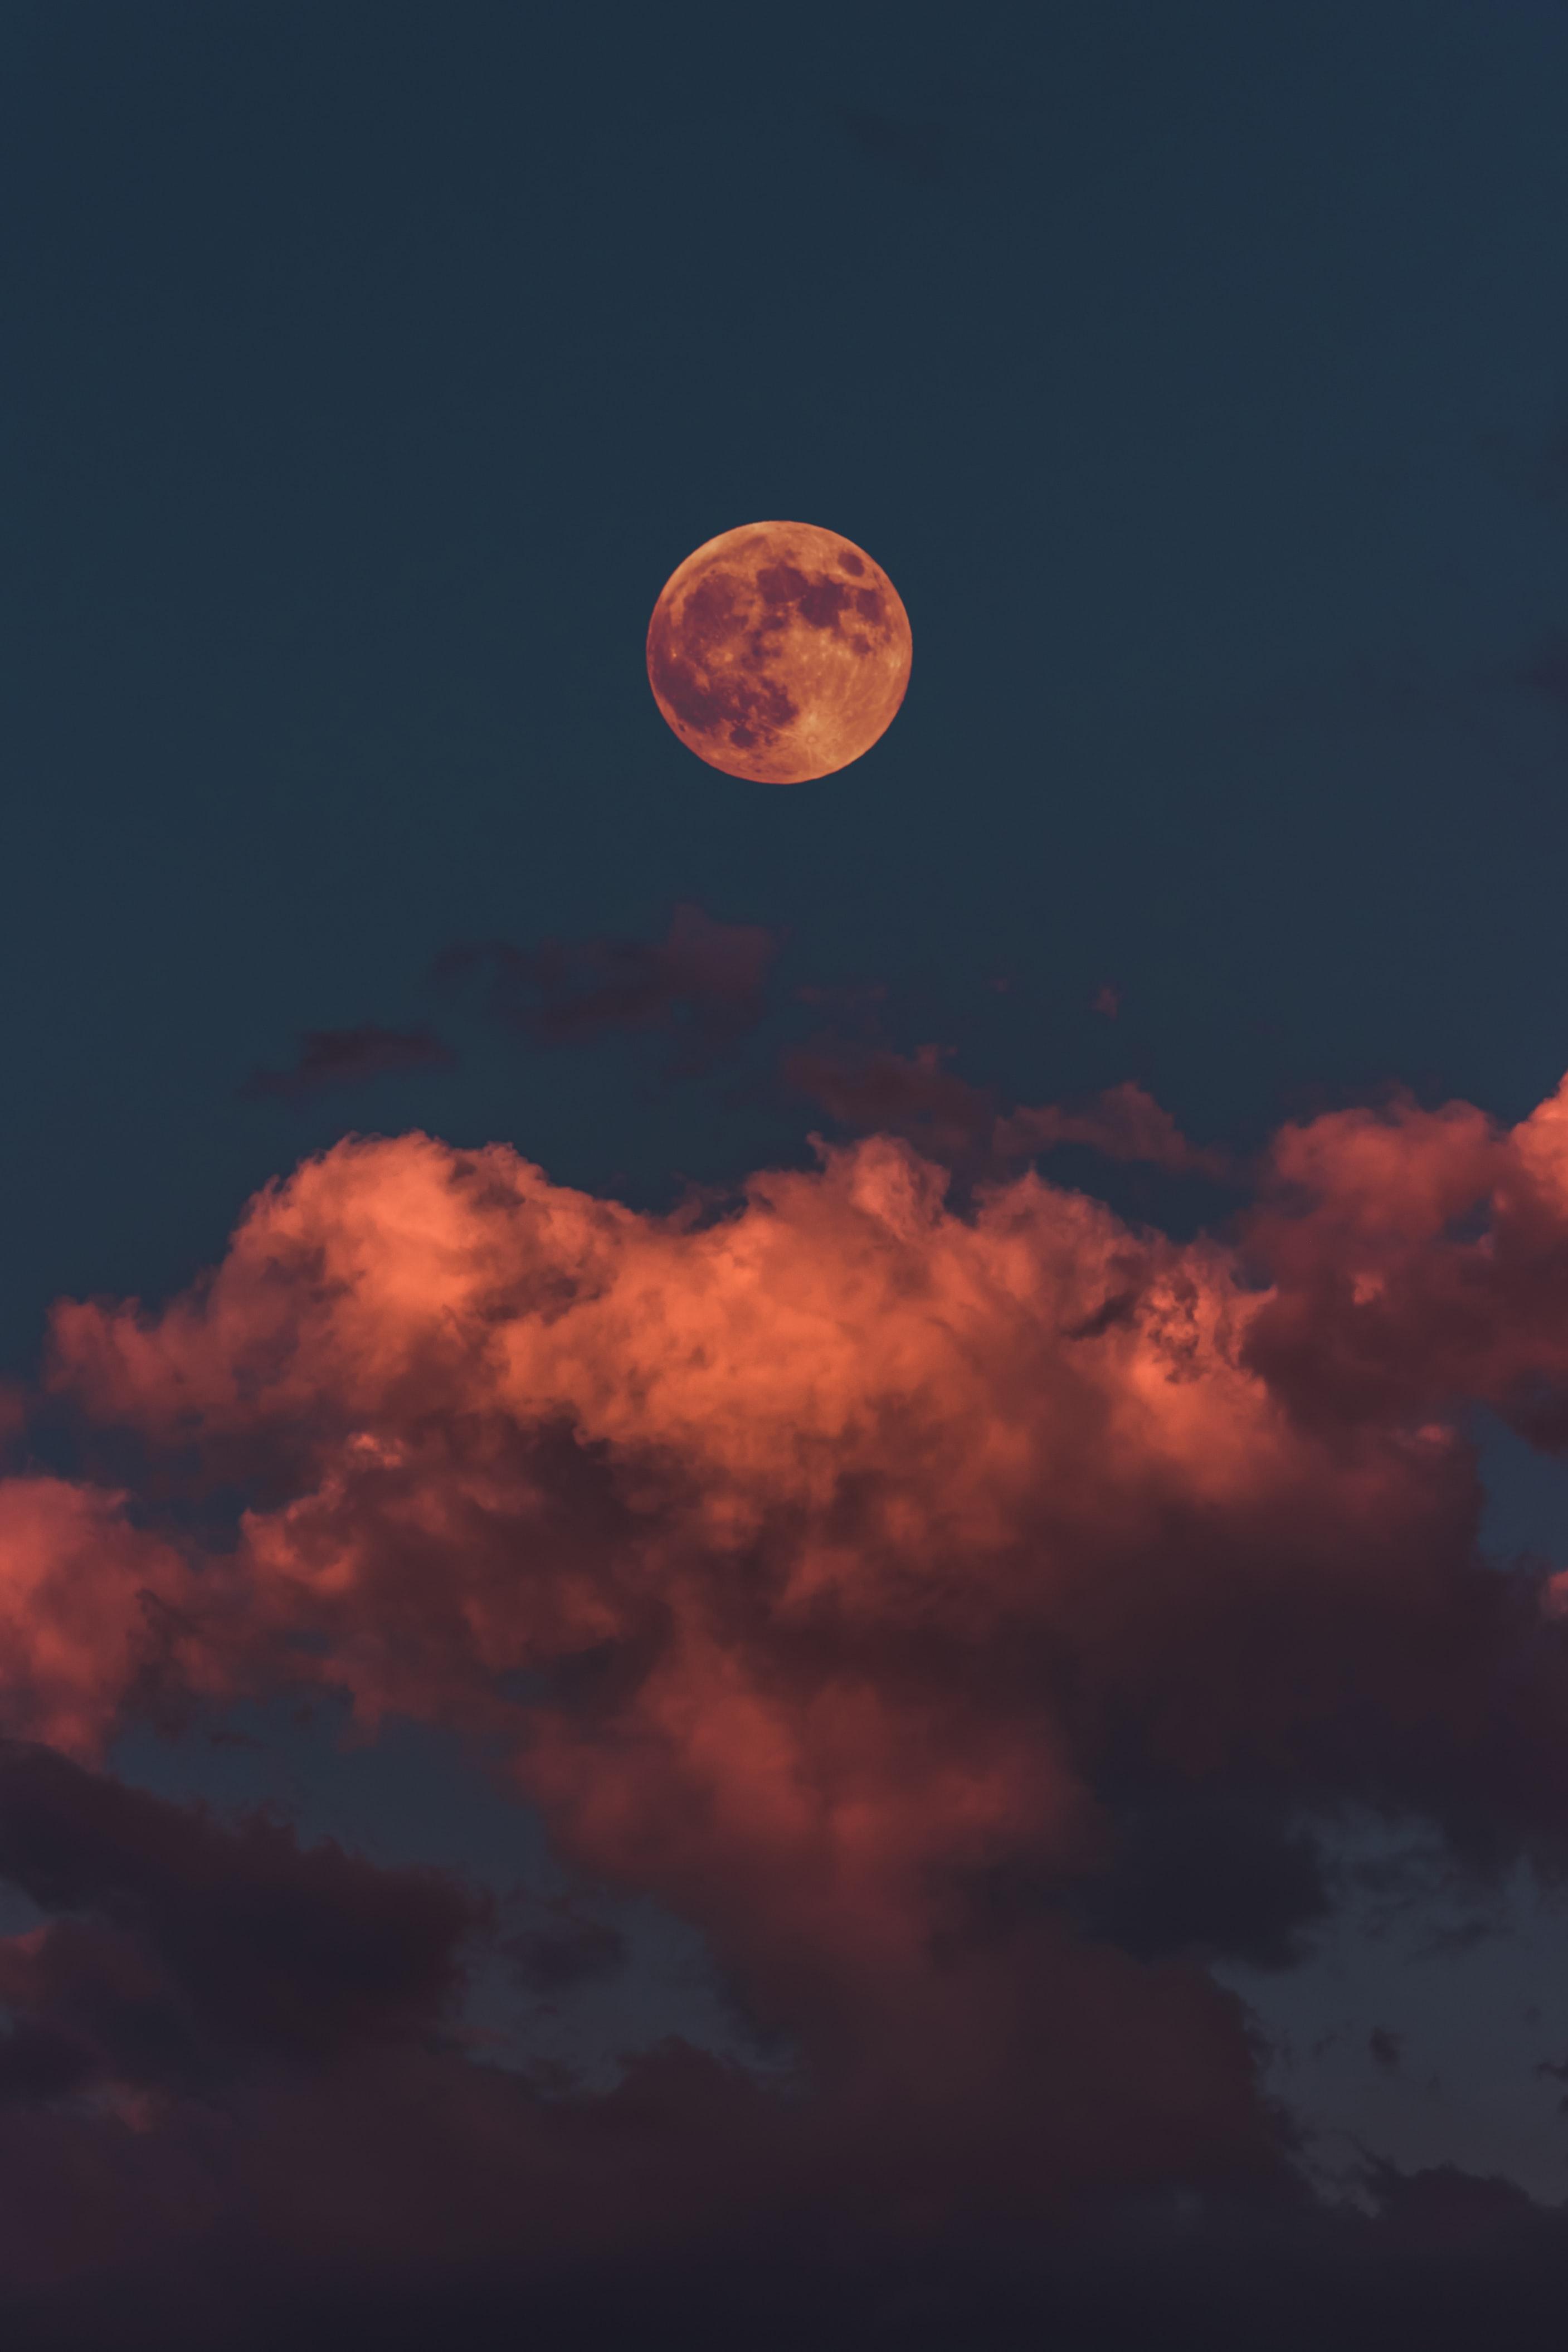 Best 100 Moon Images [hd]   Moon Wallpaper Iphone X 2172088 2814x4221